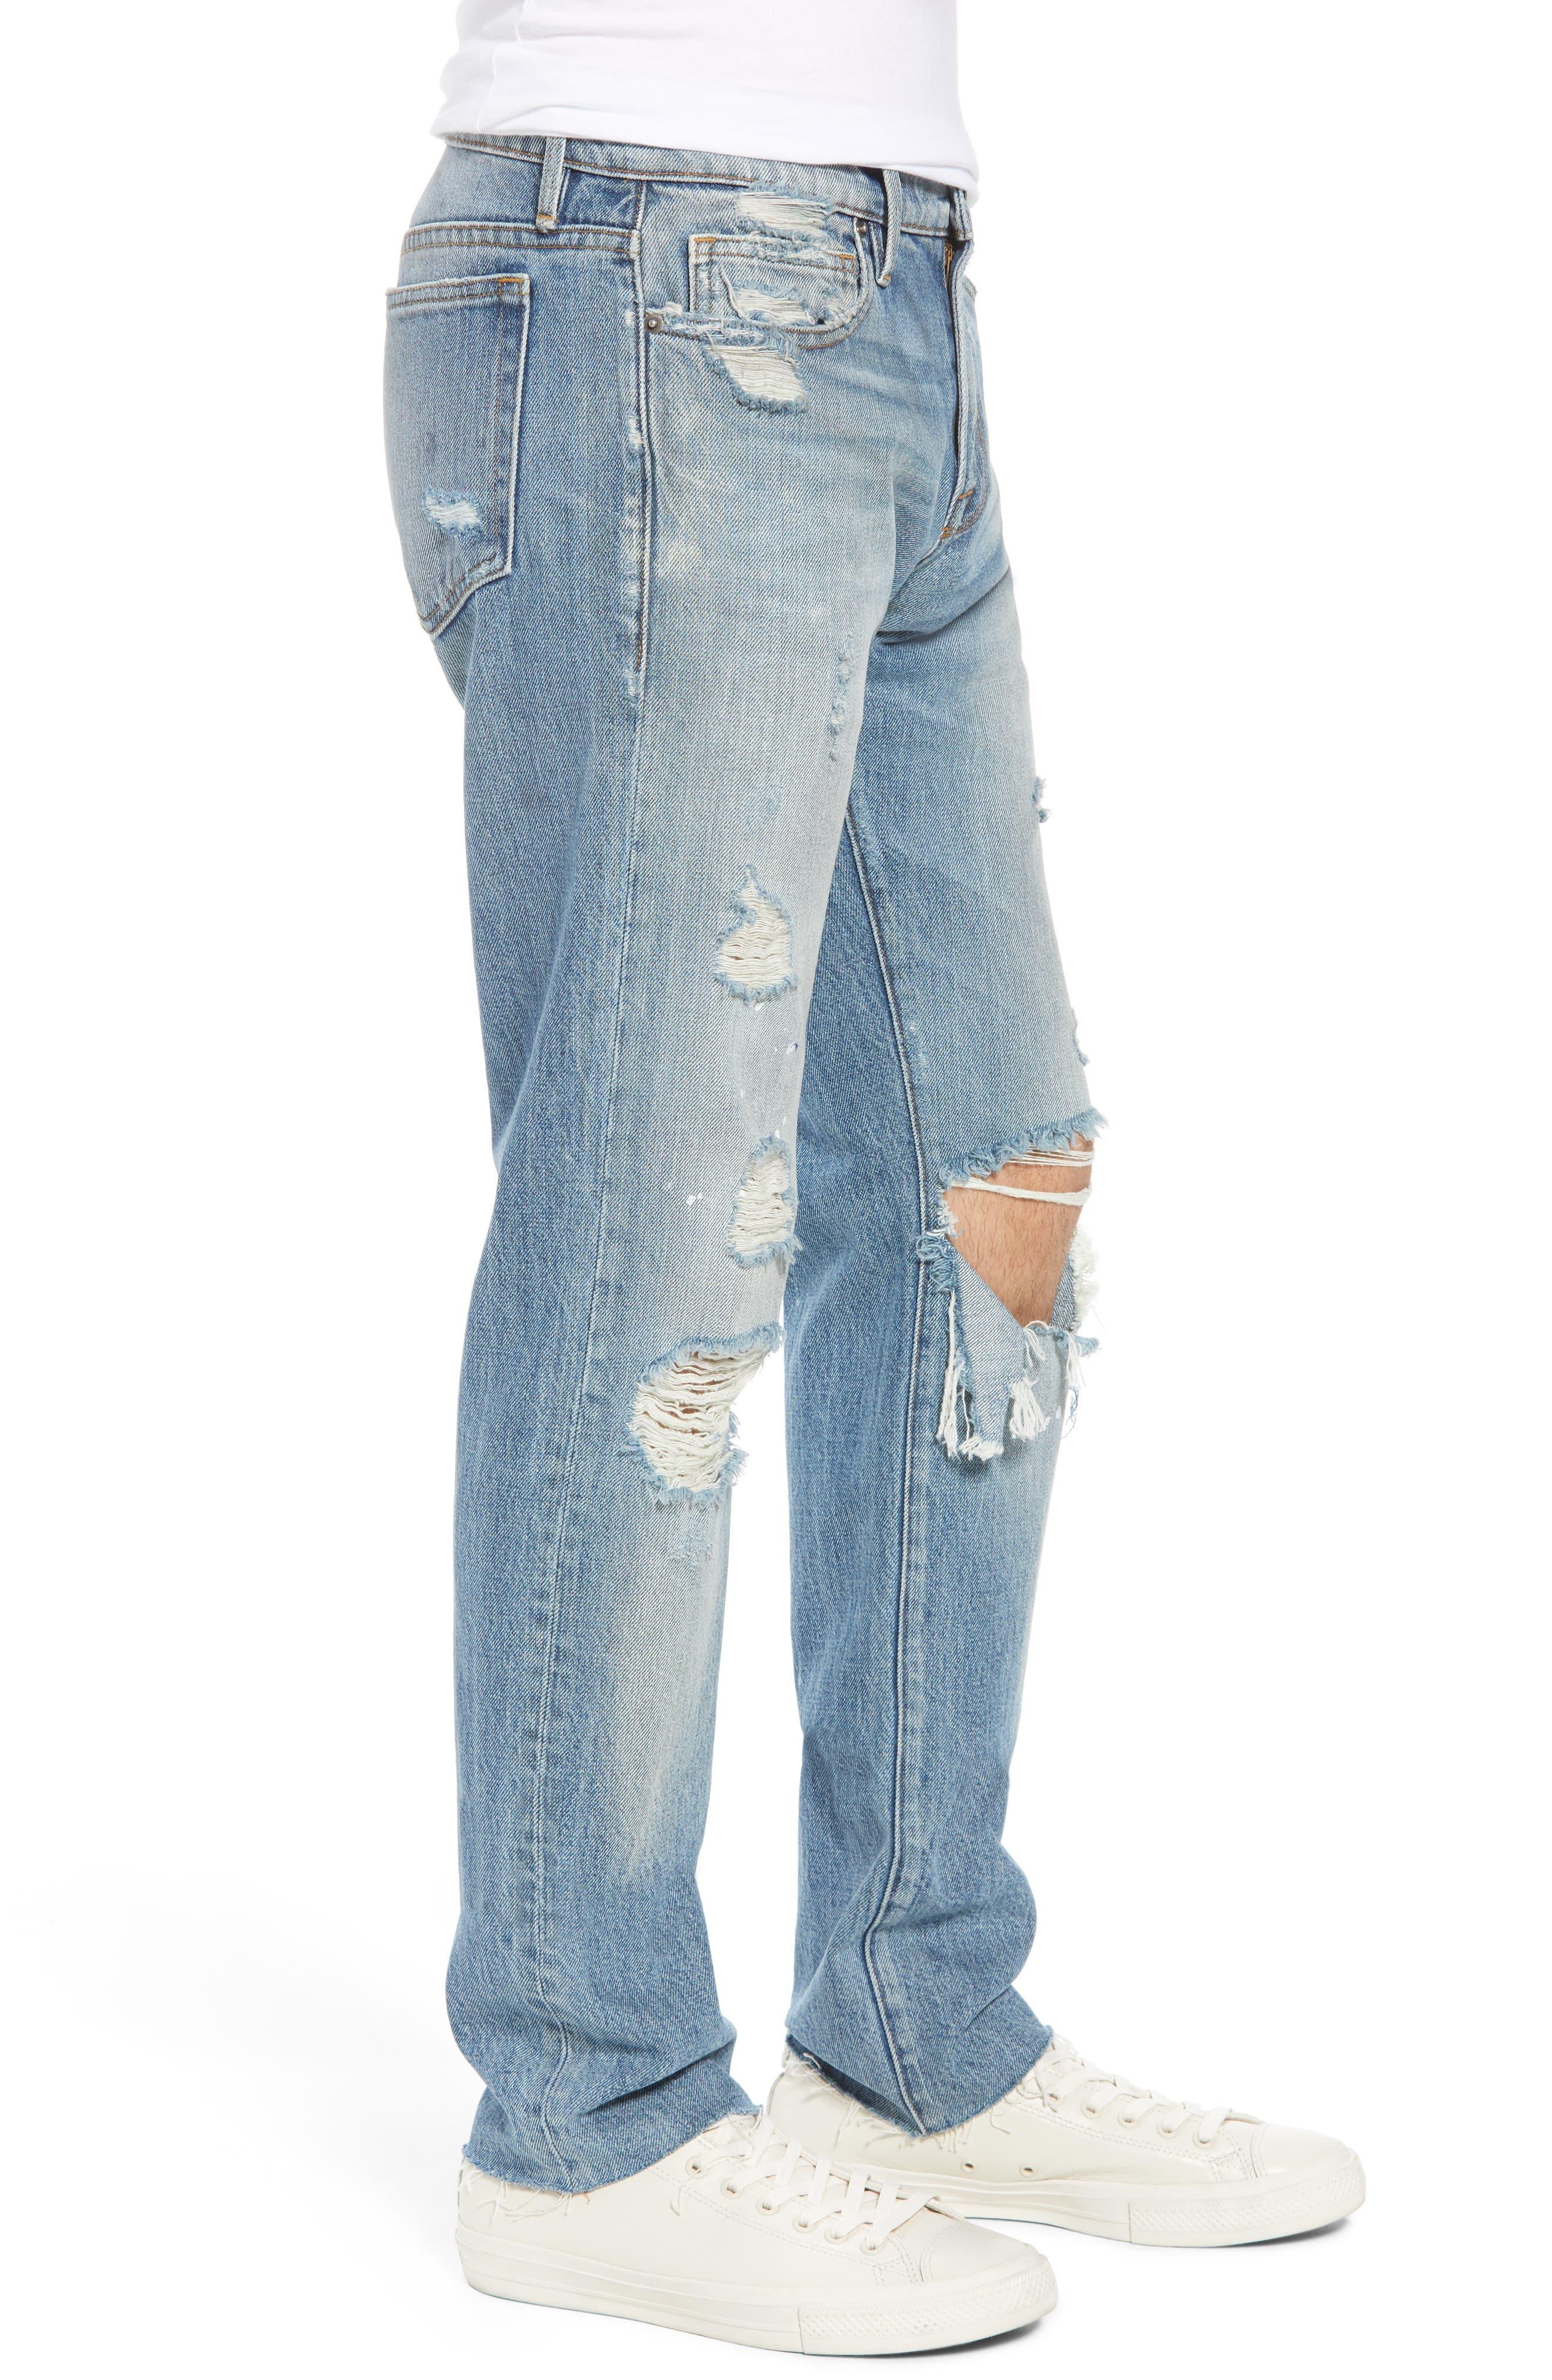 L'Homme Slim Fit Jeans,                             Alternate thumbnail 3, color,                             Bizworth